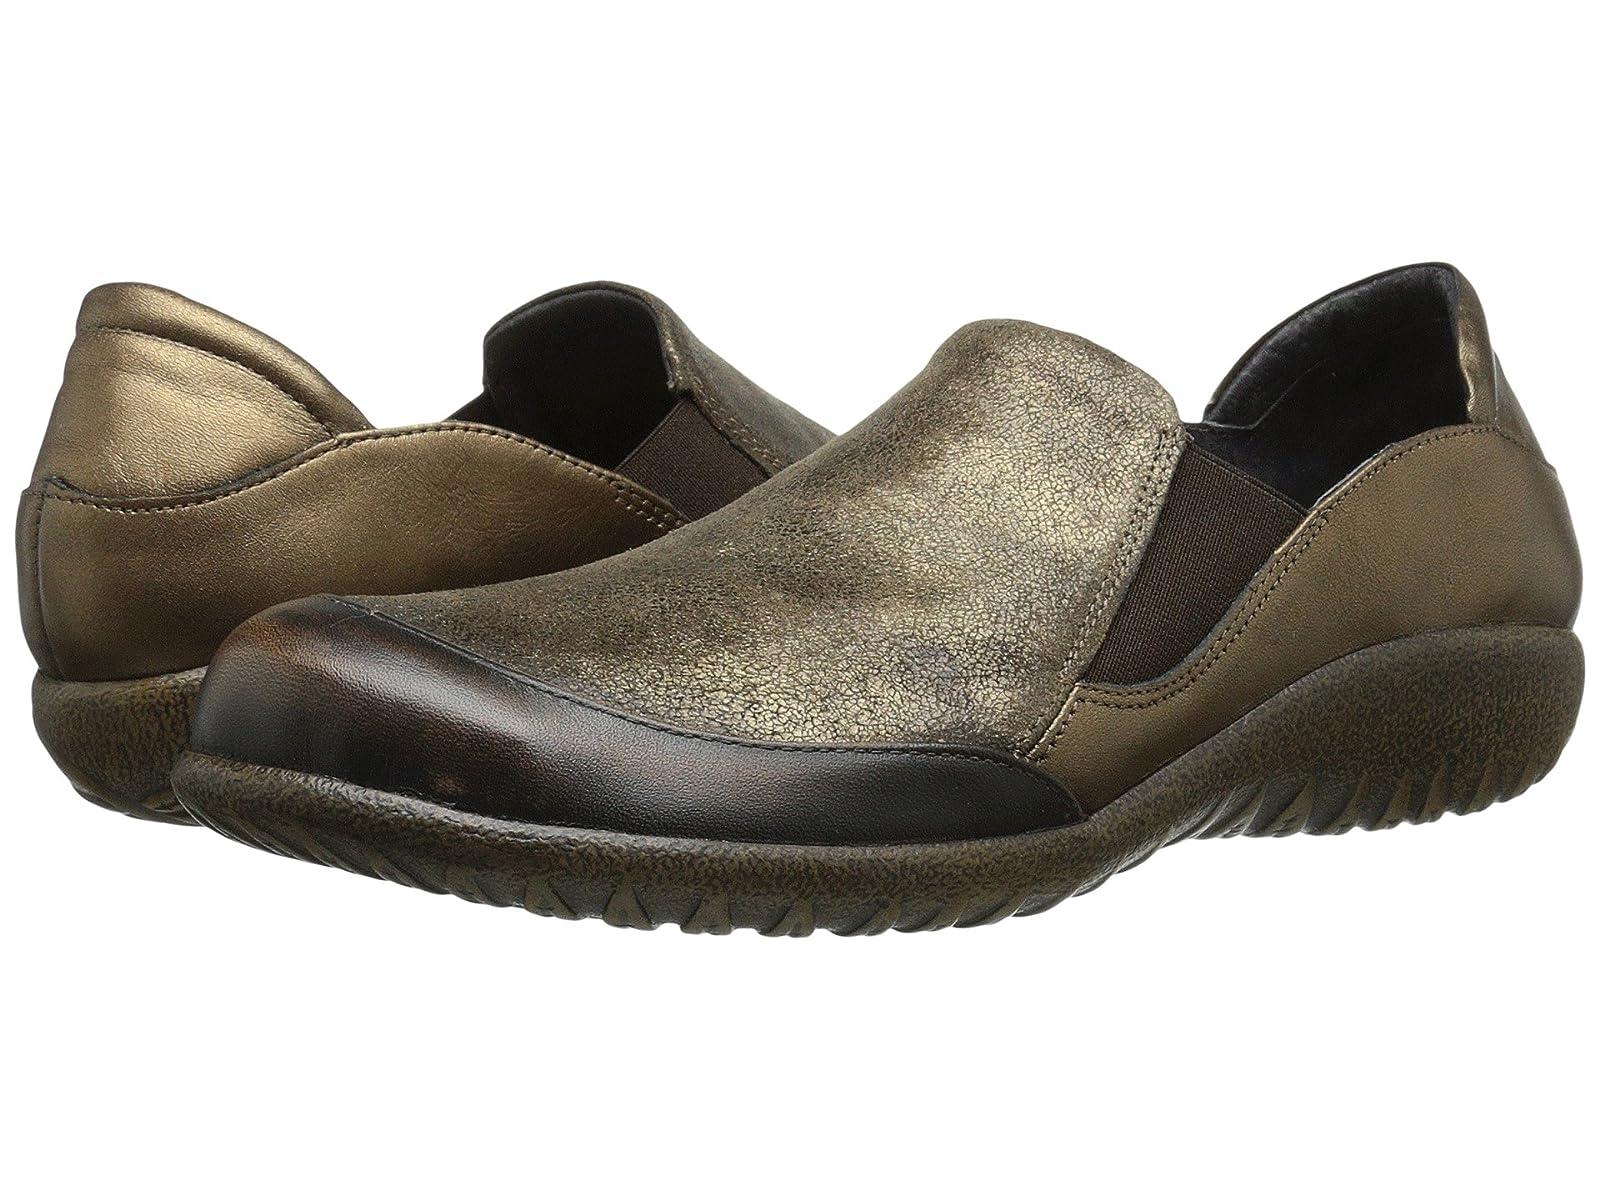 Naot MoanaCheap and distinctive eye-catching shoes